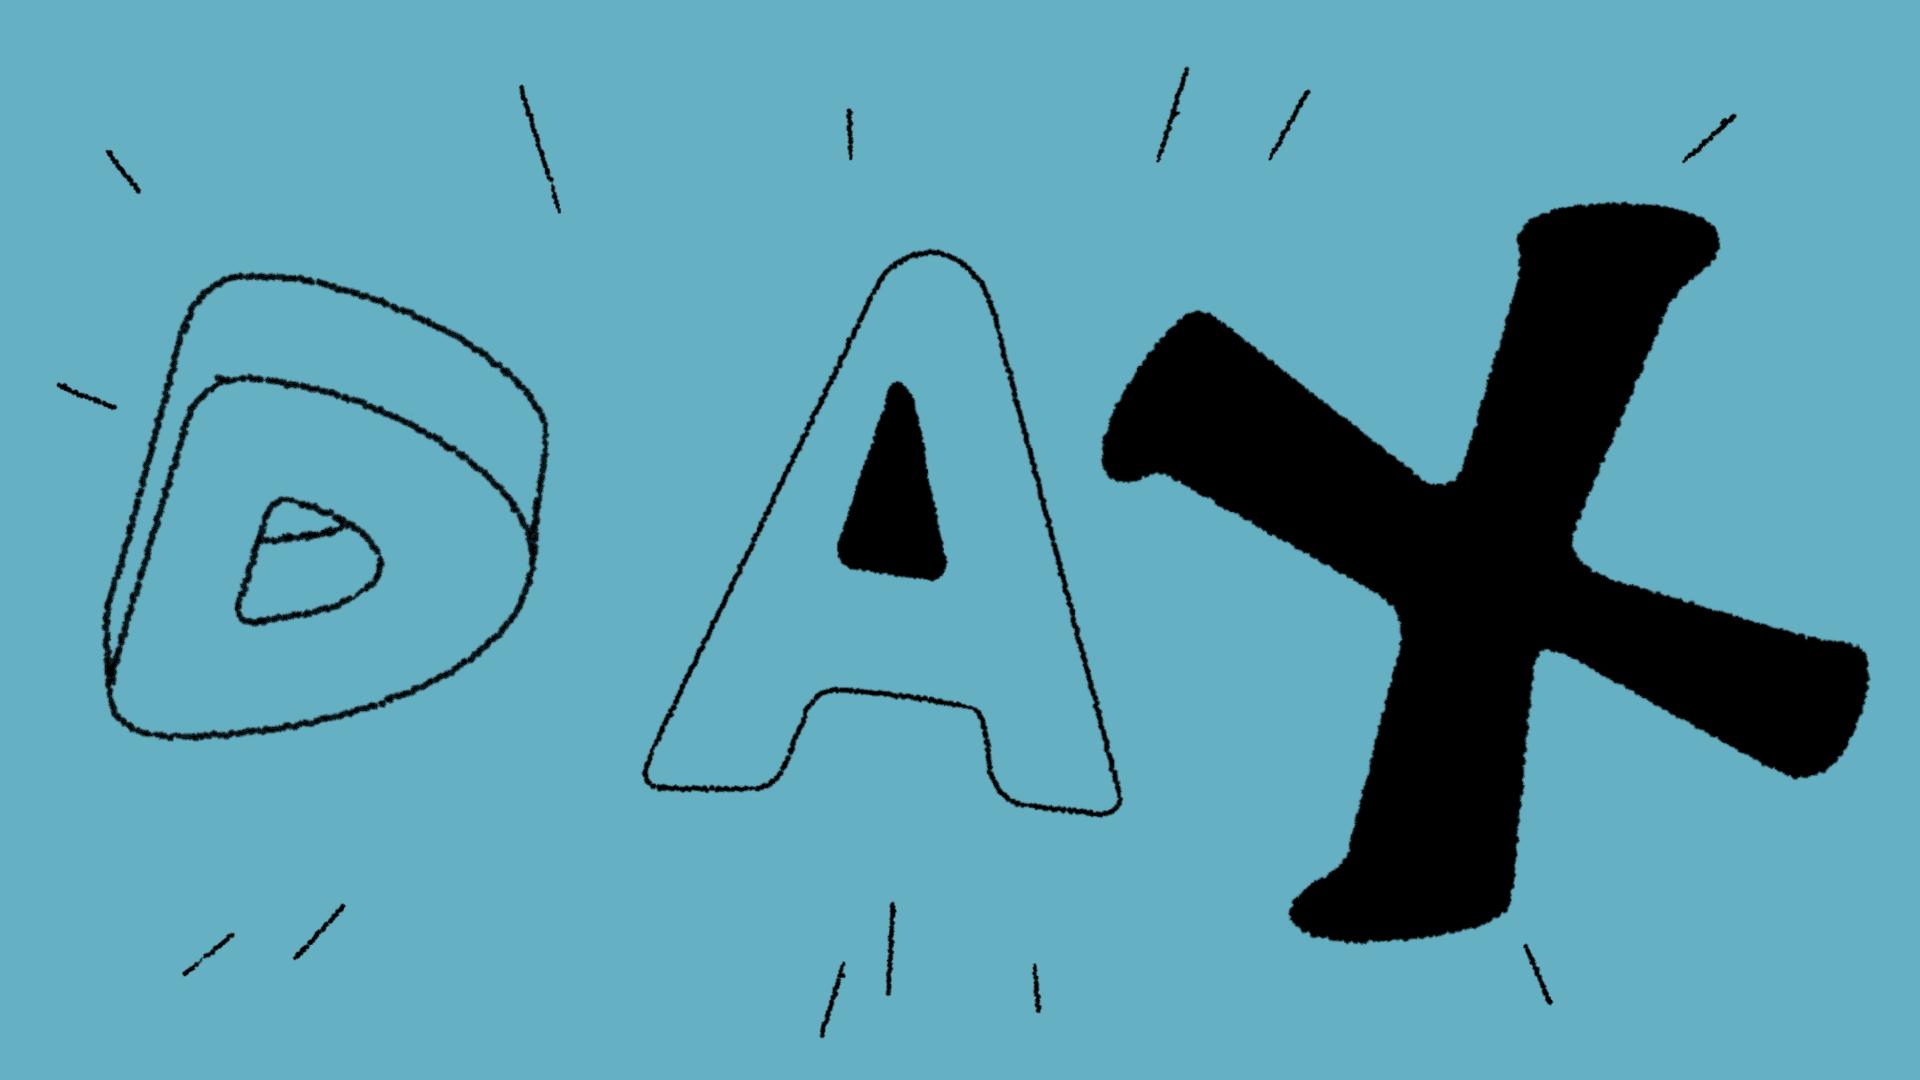 dax-sceane01